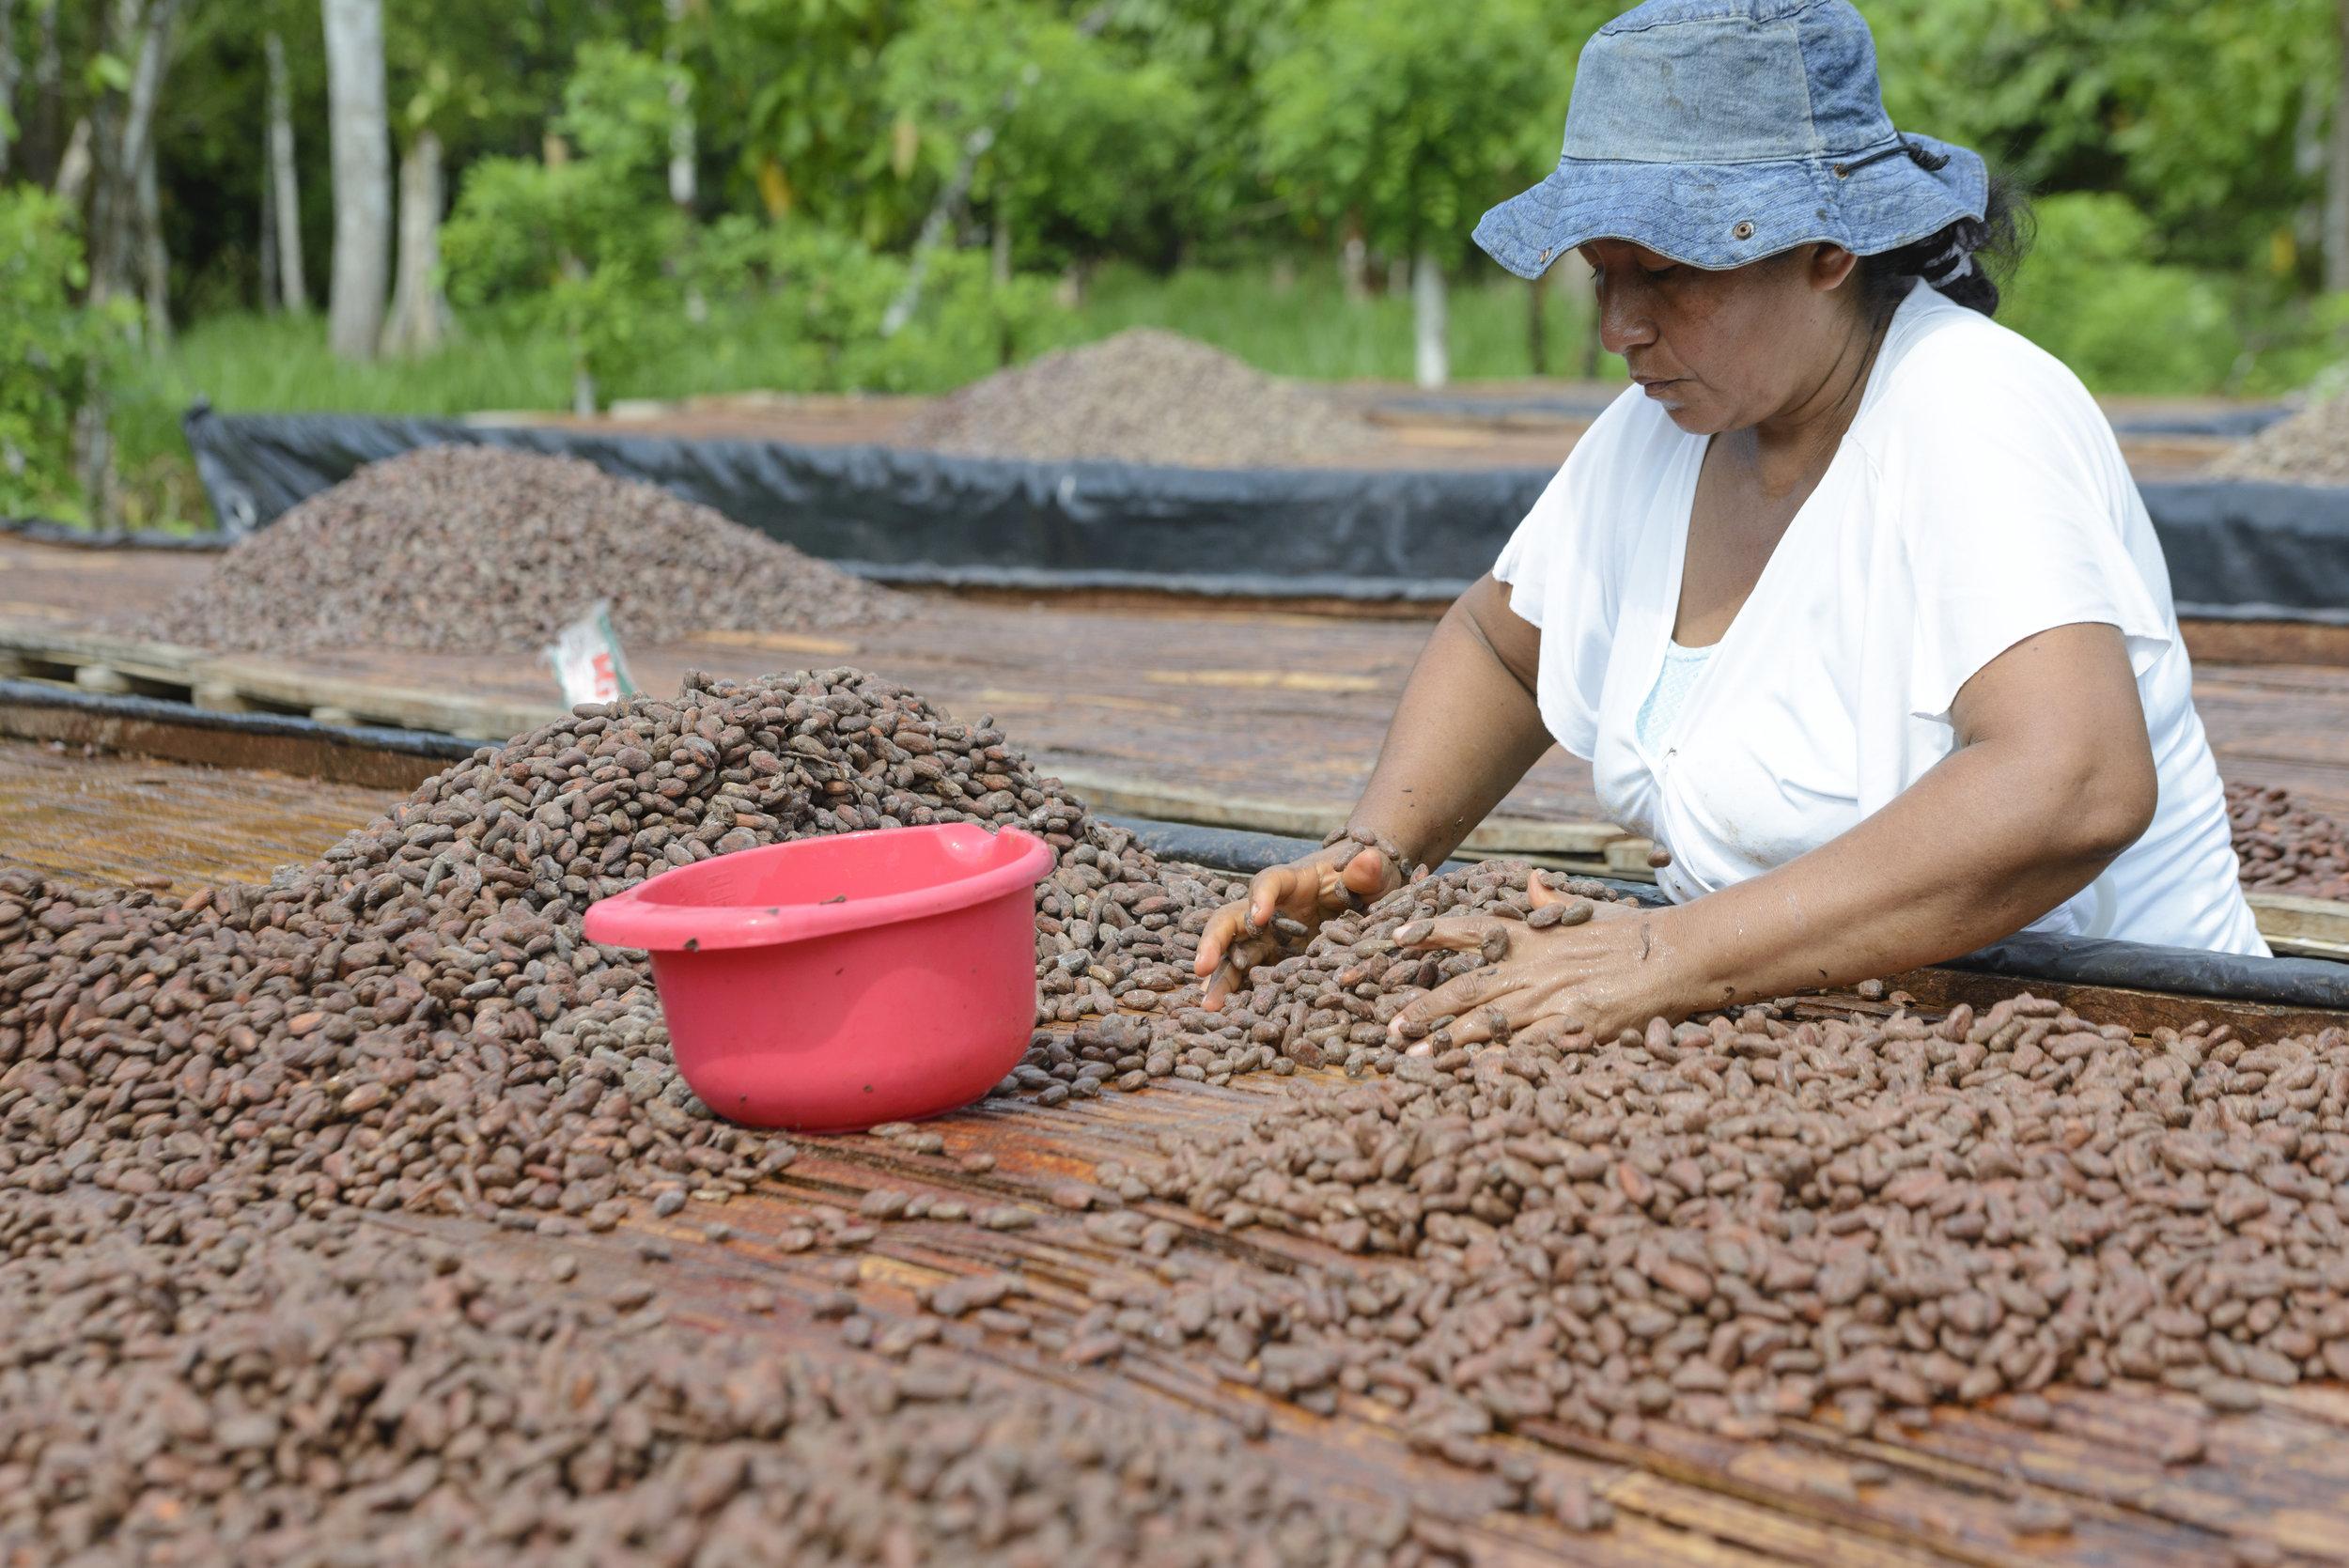 Blanca Vivera, a member of the Cortepaz Tumaco association and second generation farmer